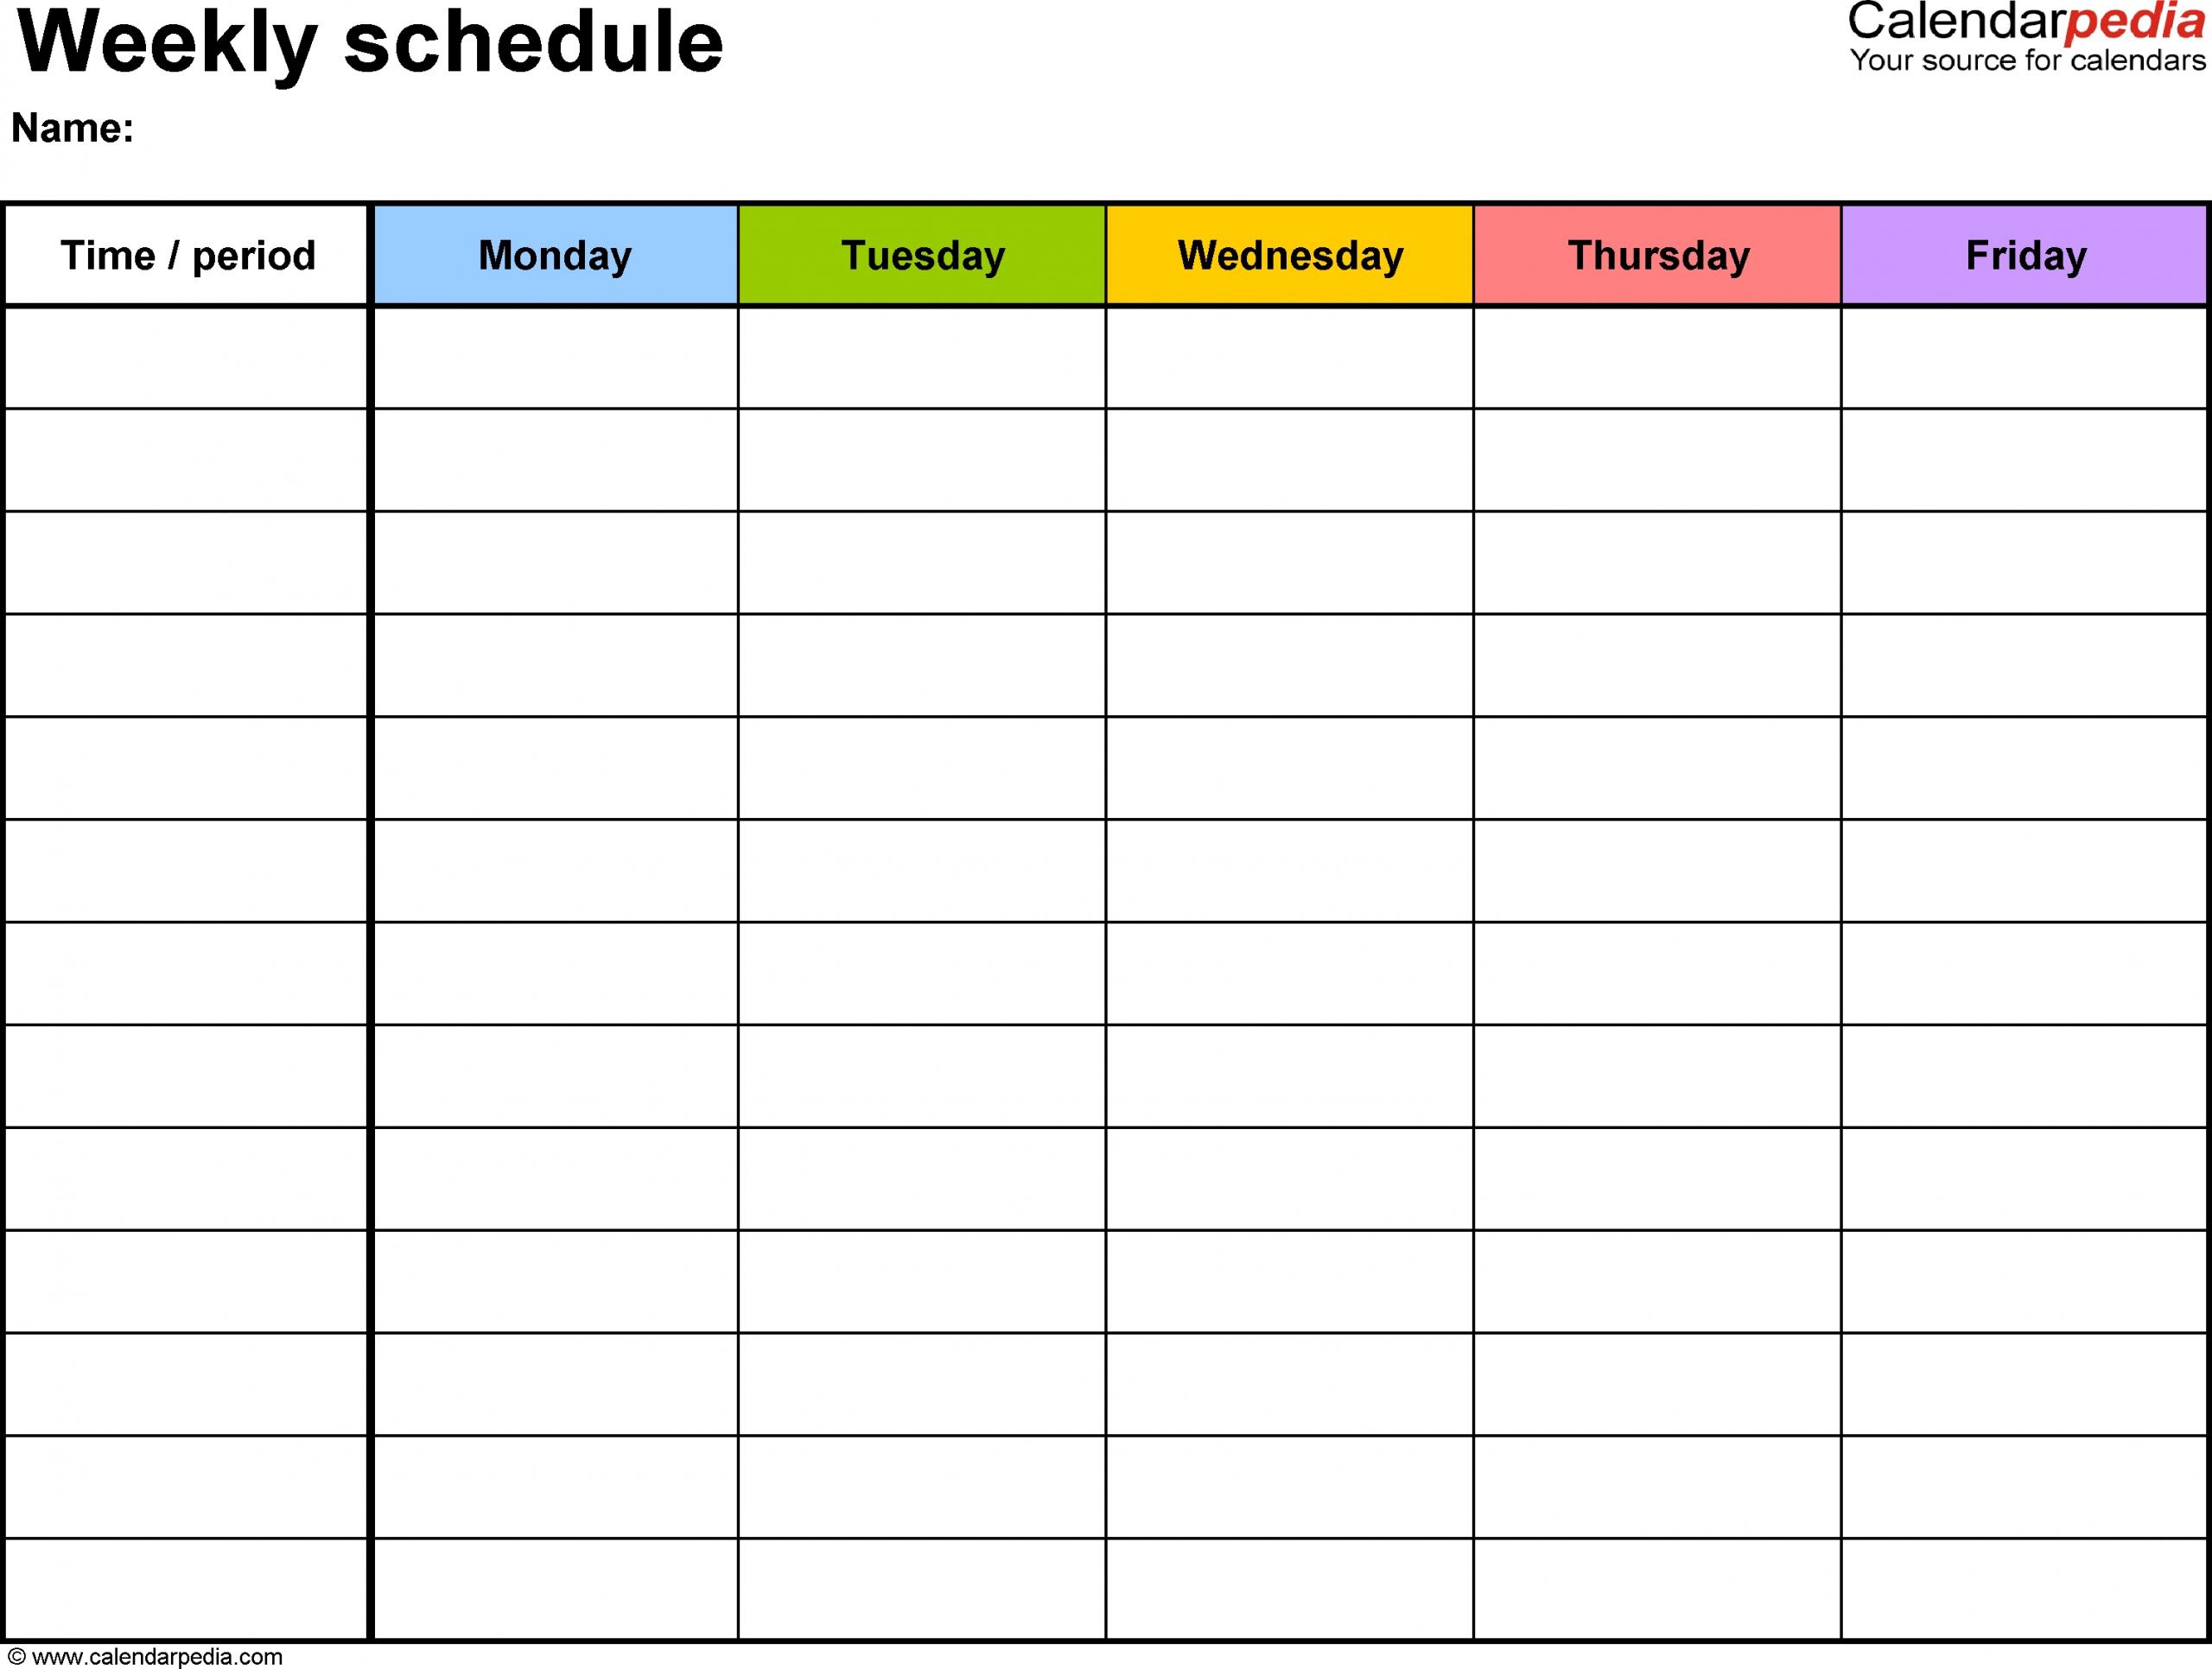 7 Day Blank Calendar Template - Calendar Inspiration Design Blank 7 Day Schedule